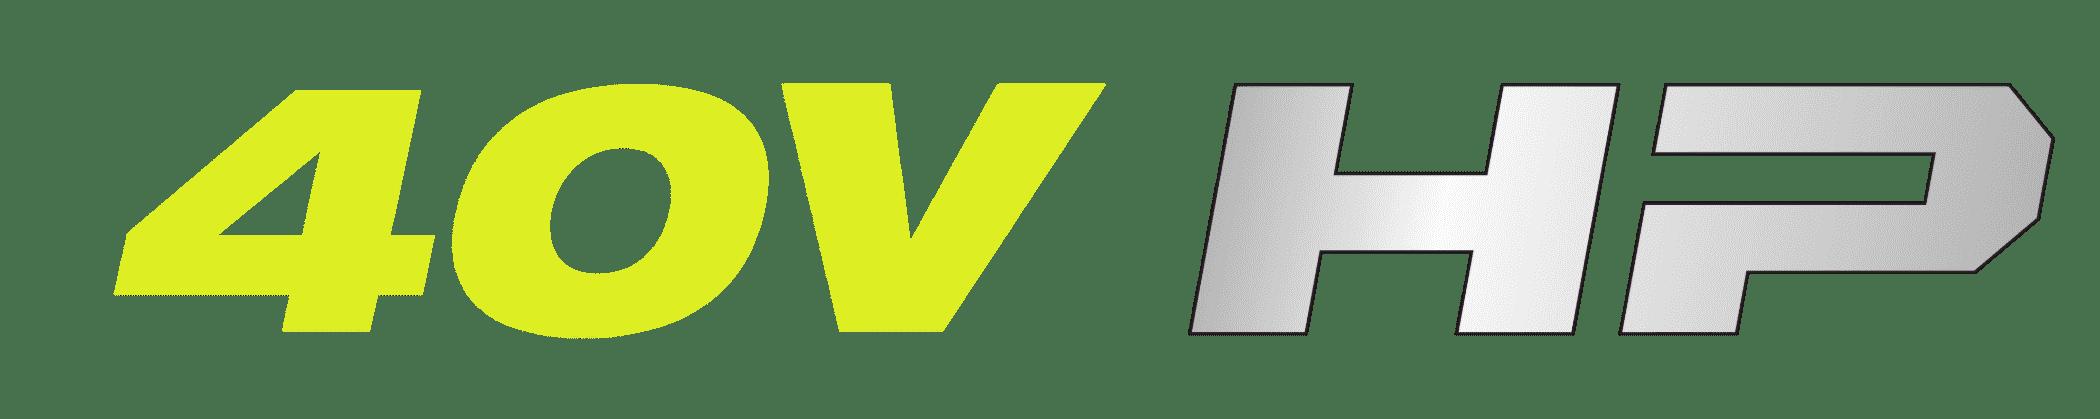 Symbol, Parallel, Font, Yellow